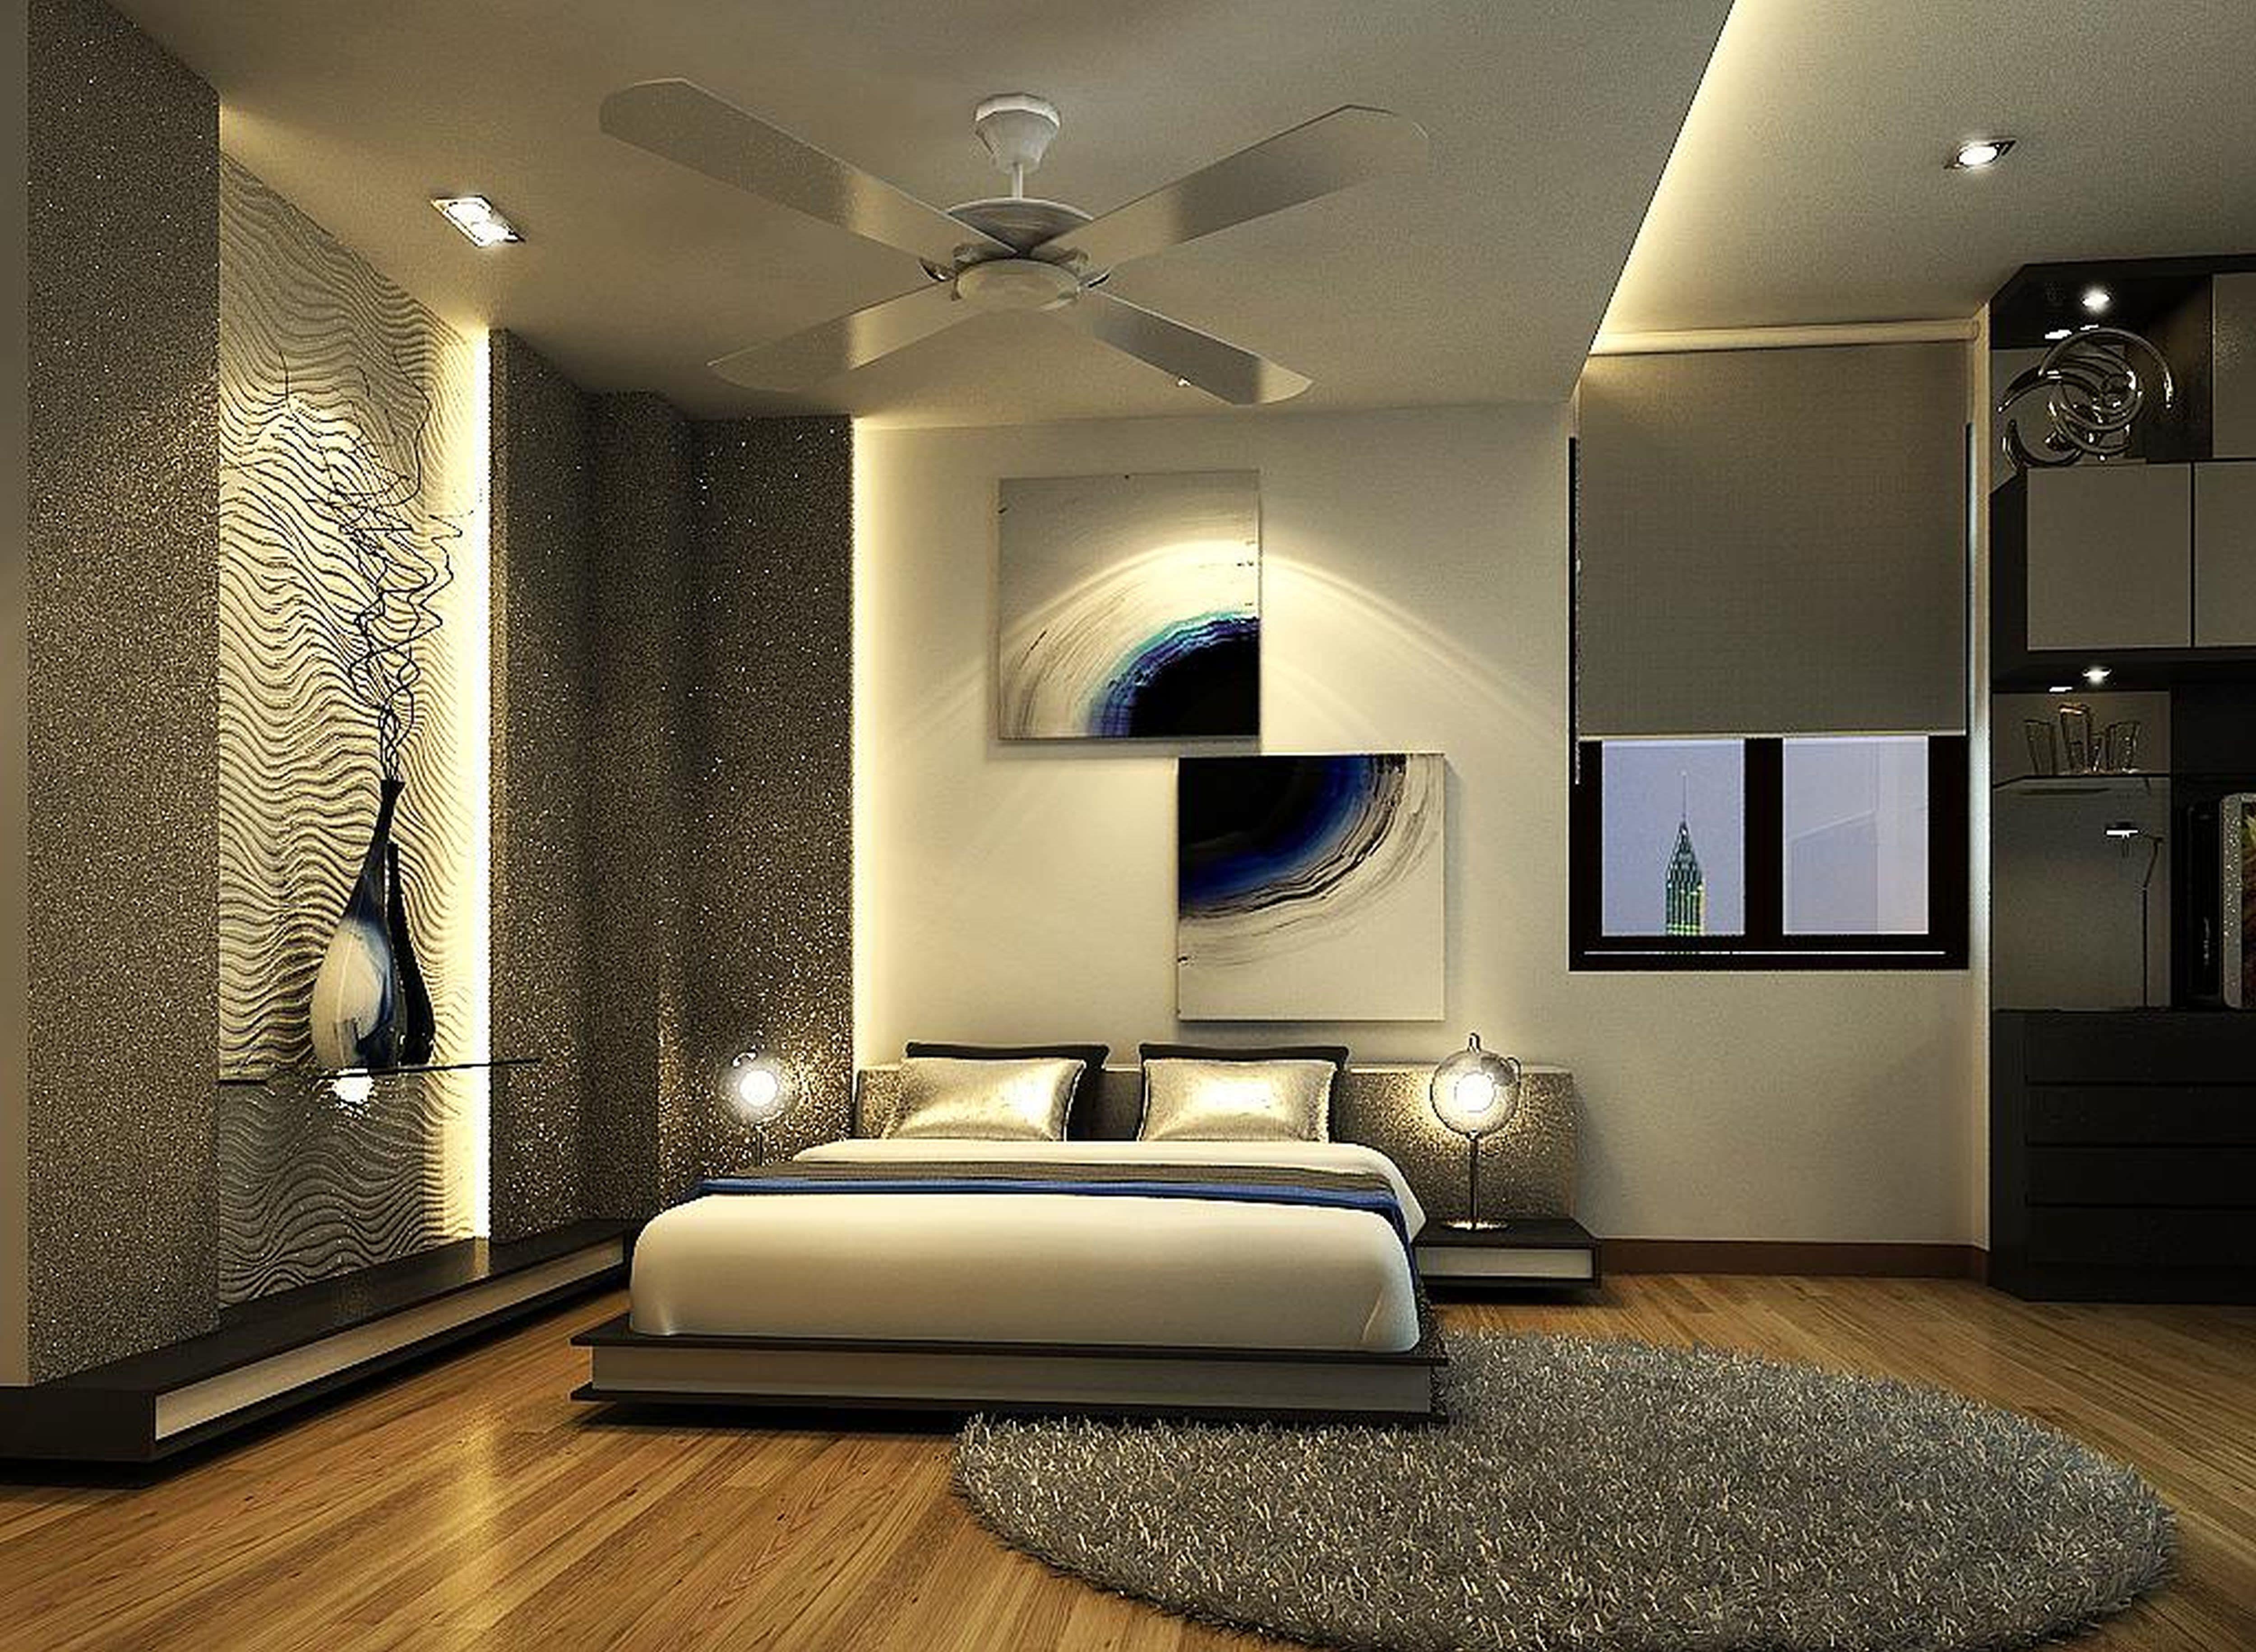 160 Stylish Bedroom Stunning Design Bedroom Jpg 5000 3662